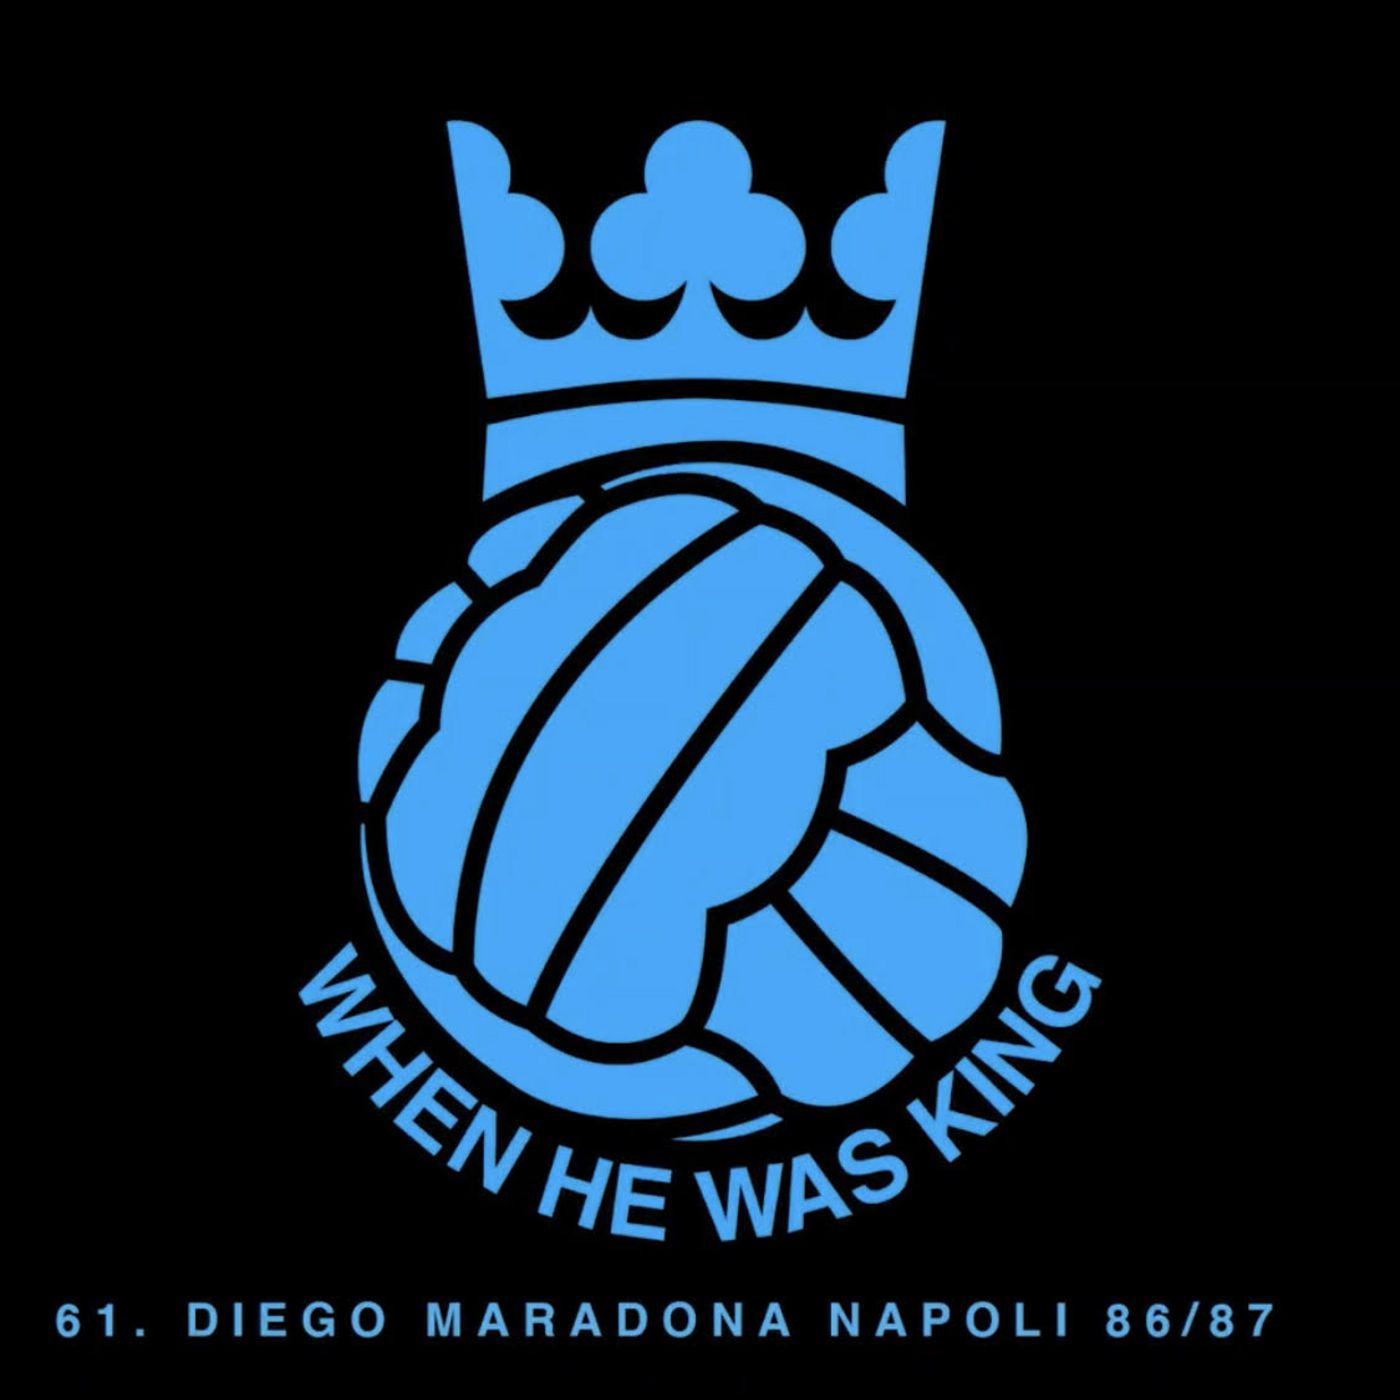 61. Diego Maradona Napoli 1986/87